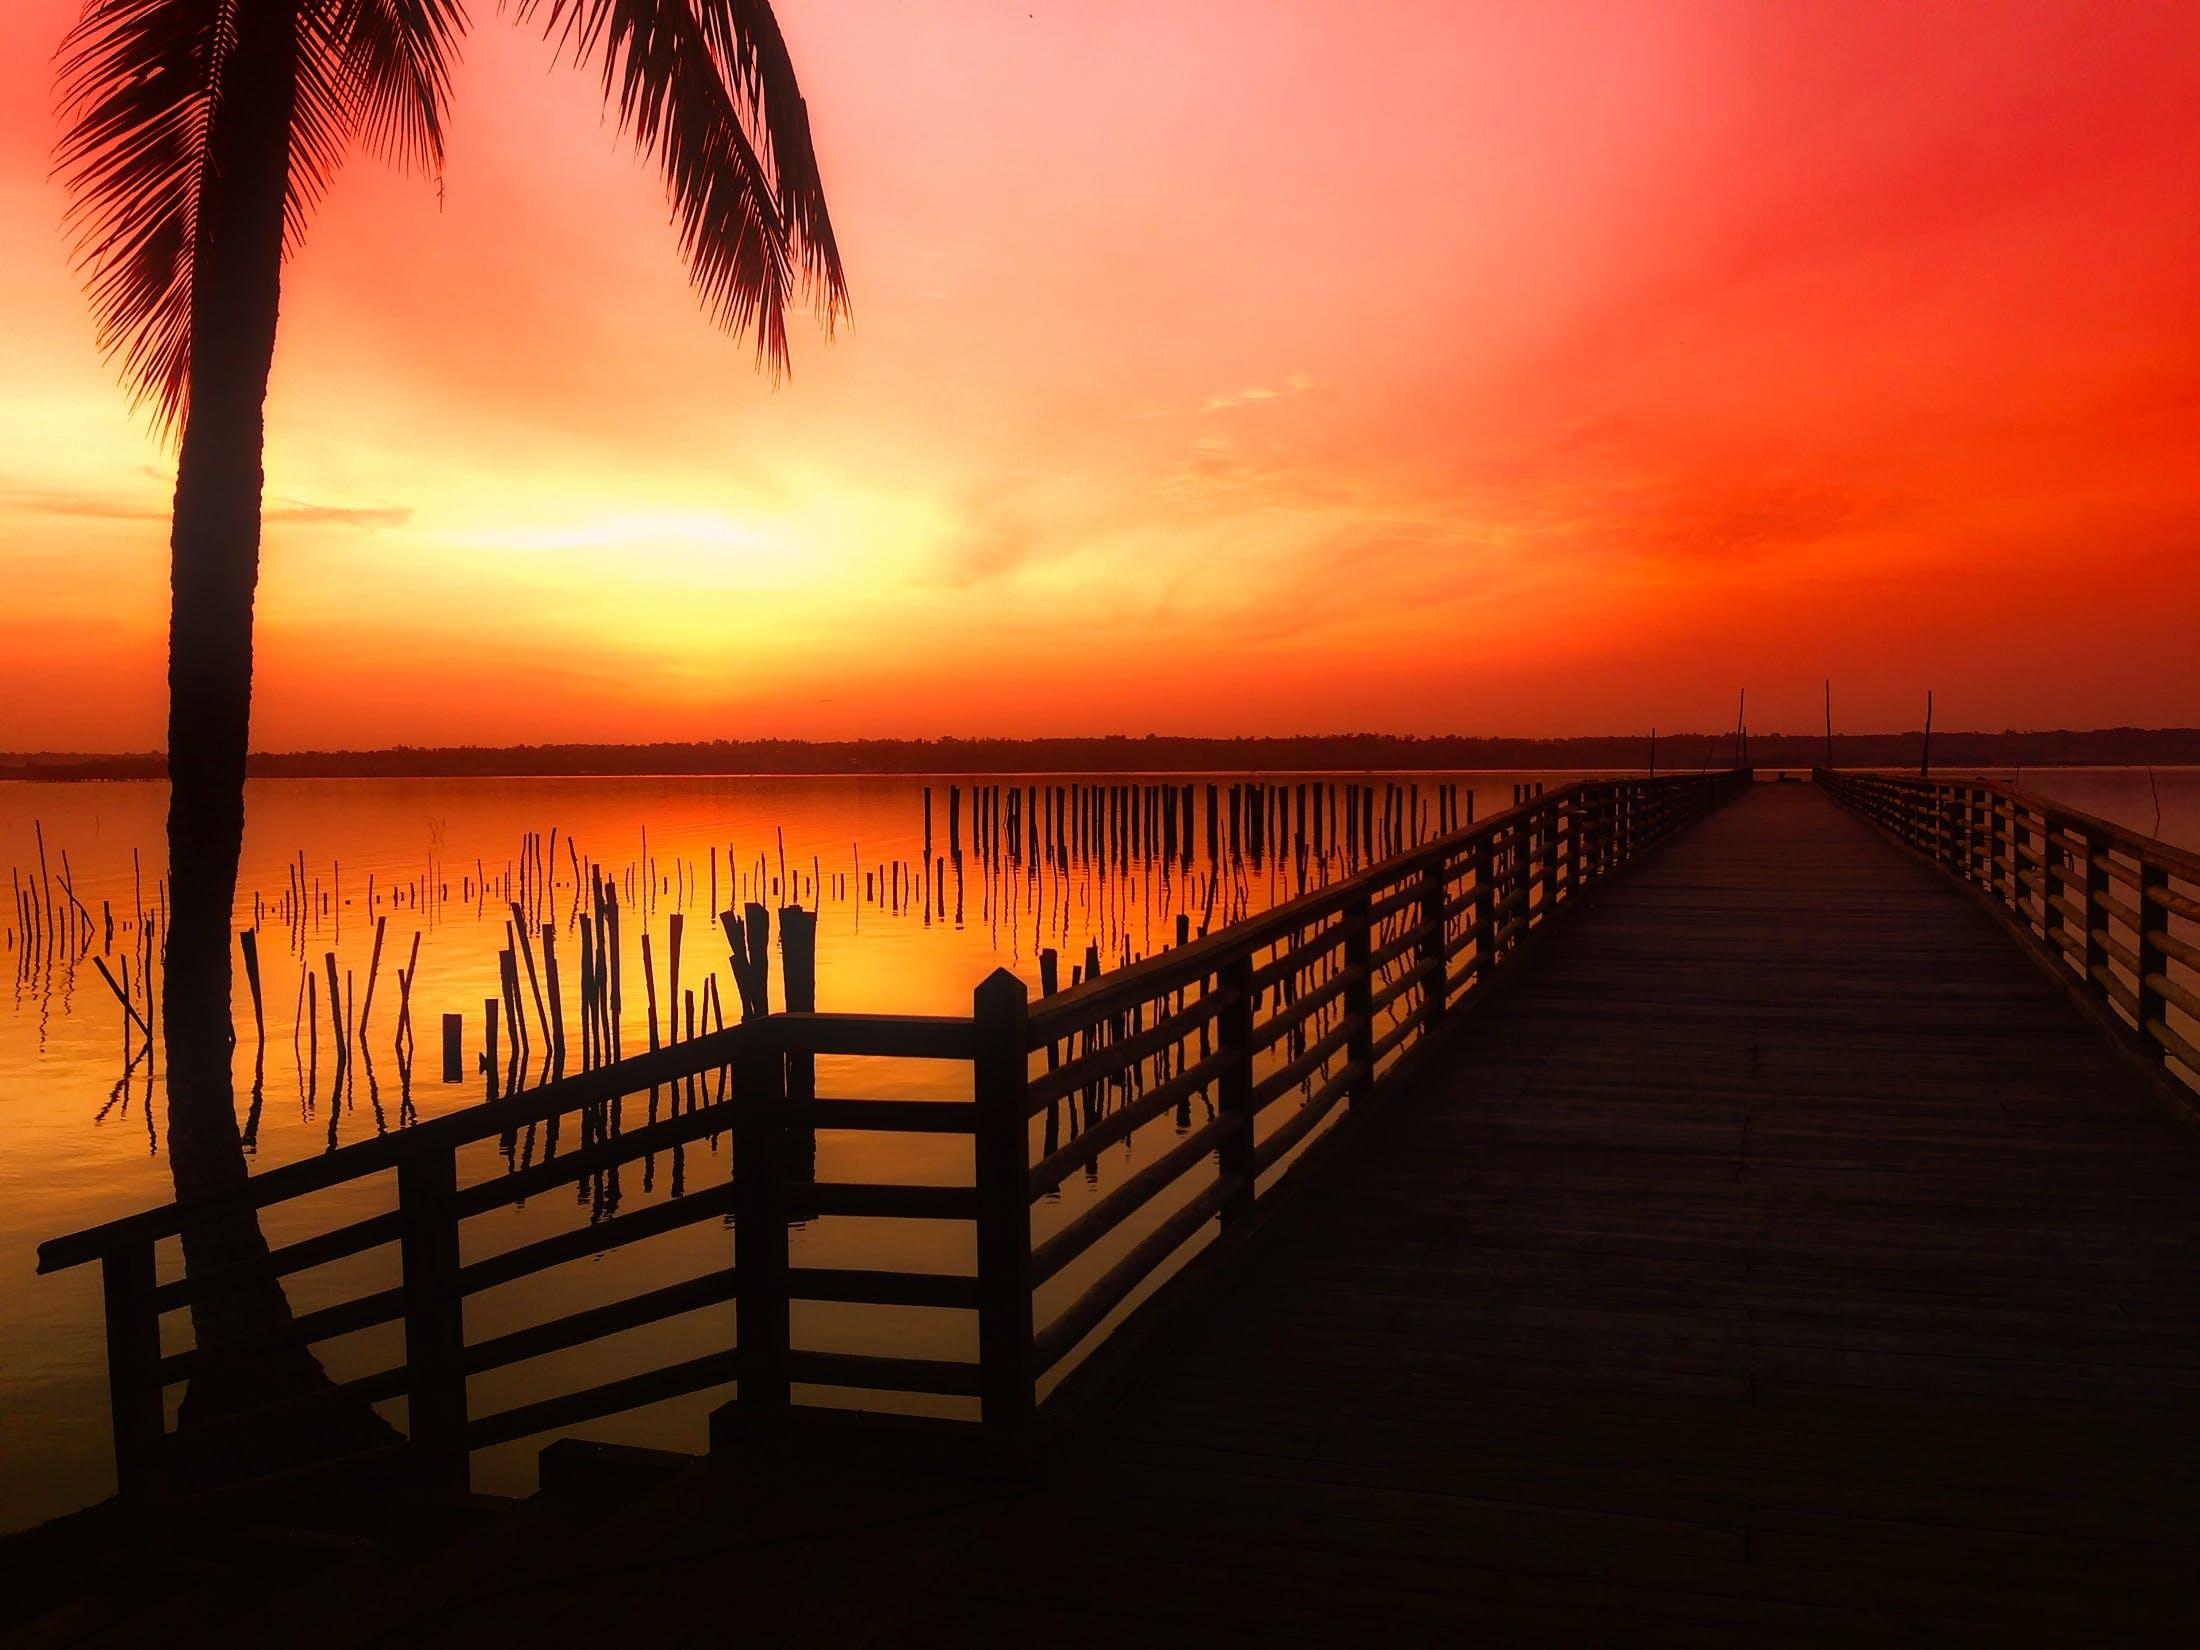 Silhouette Photo of Dock in Golden Hour